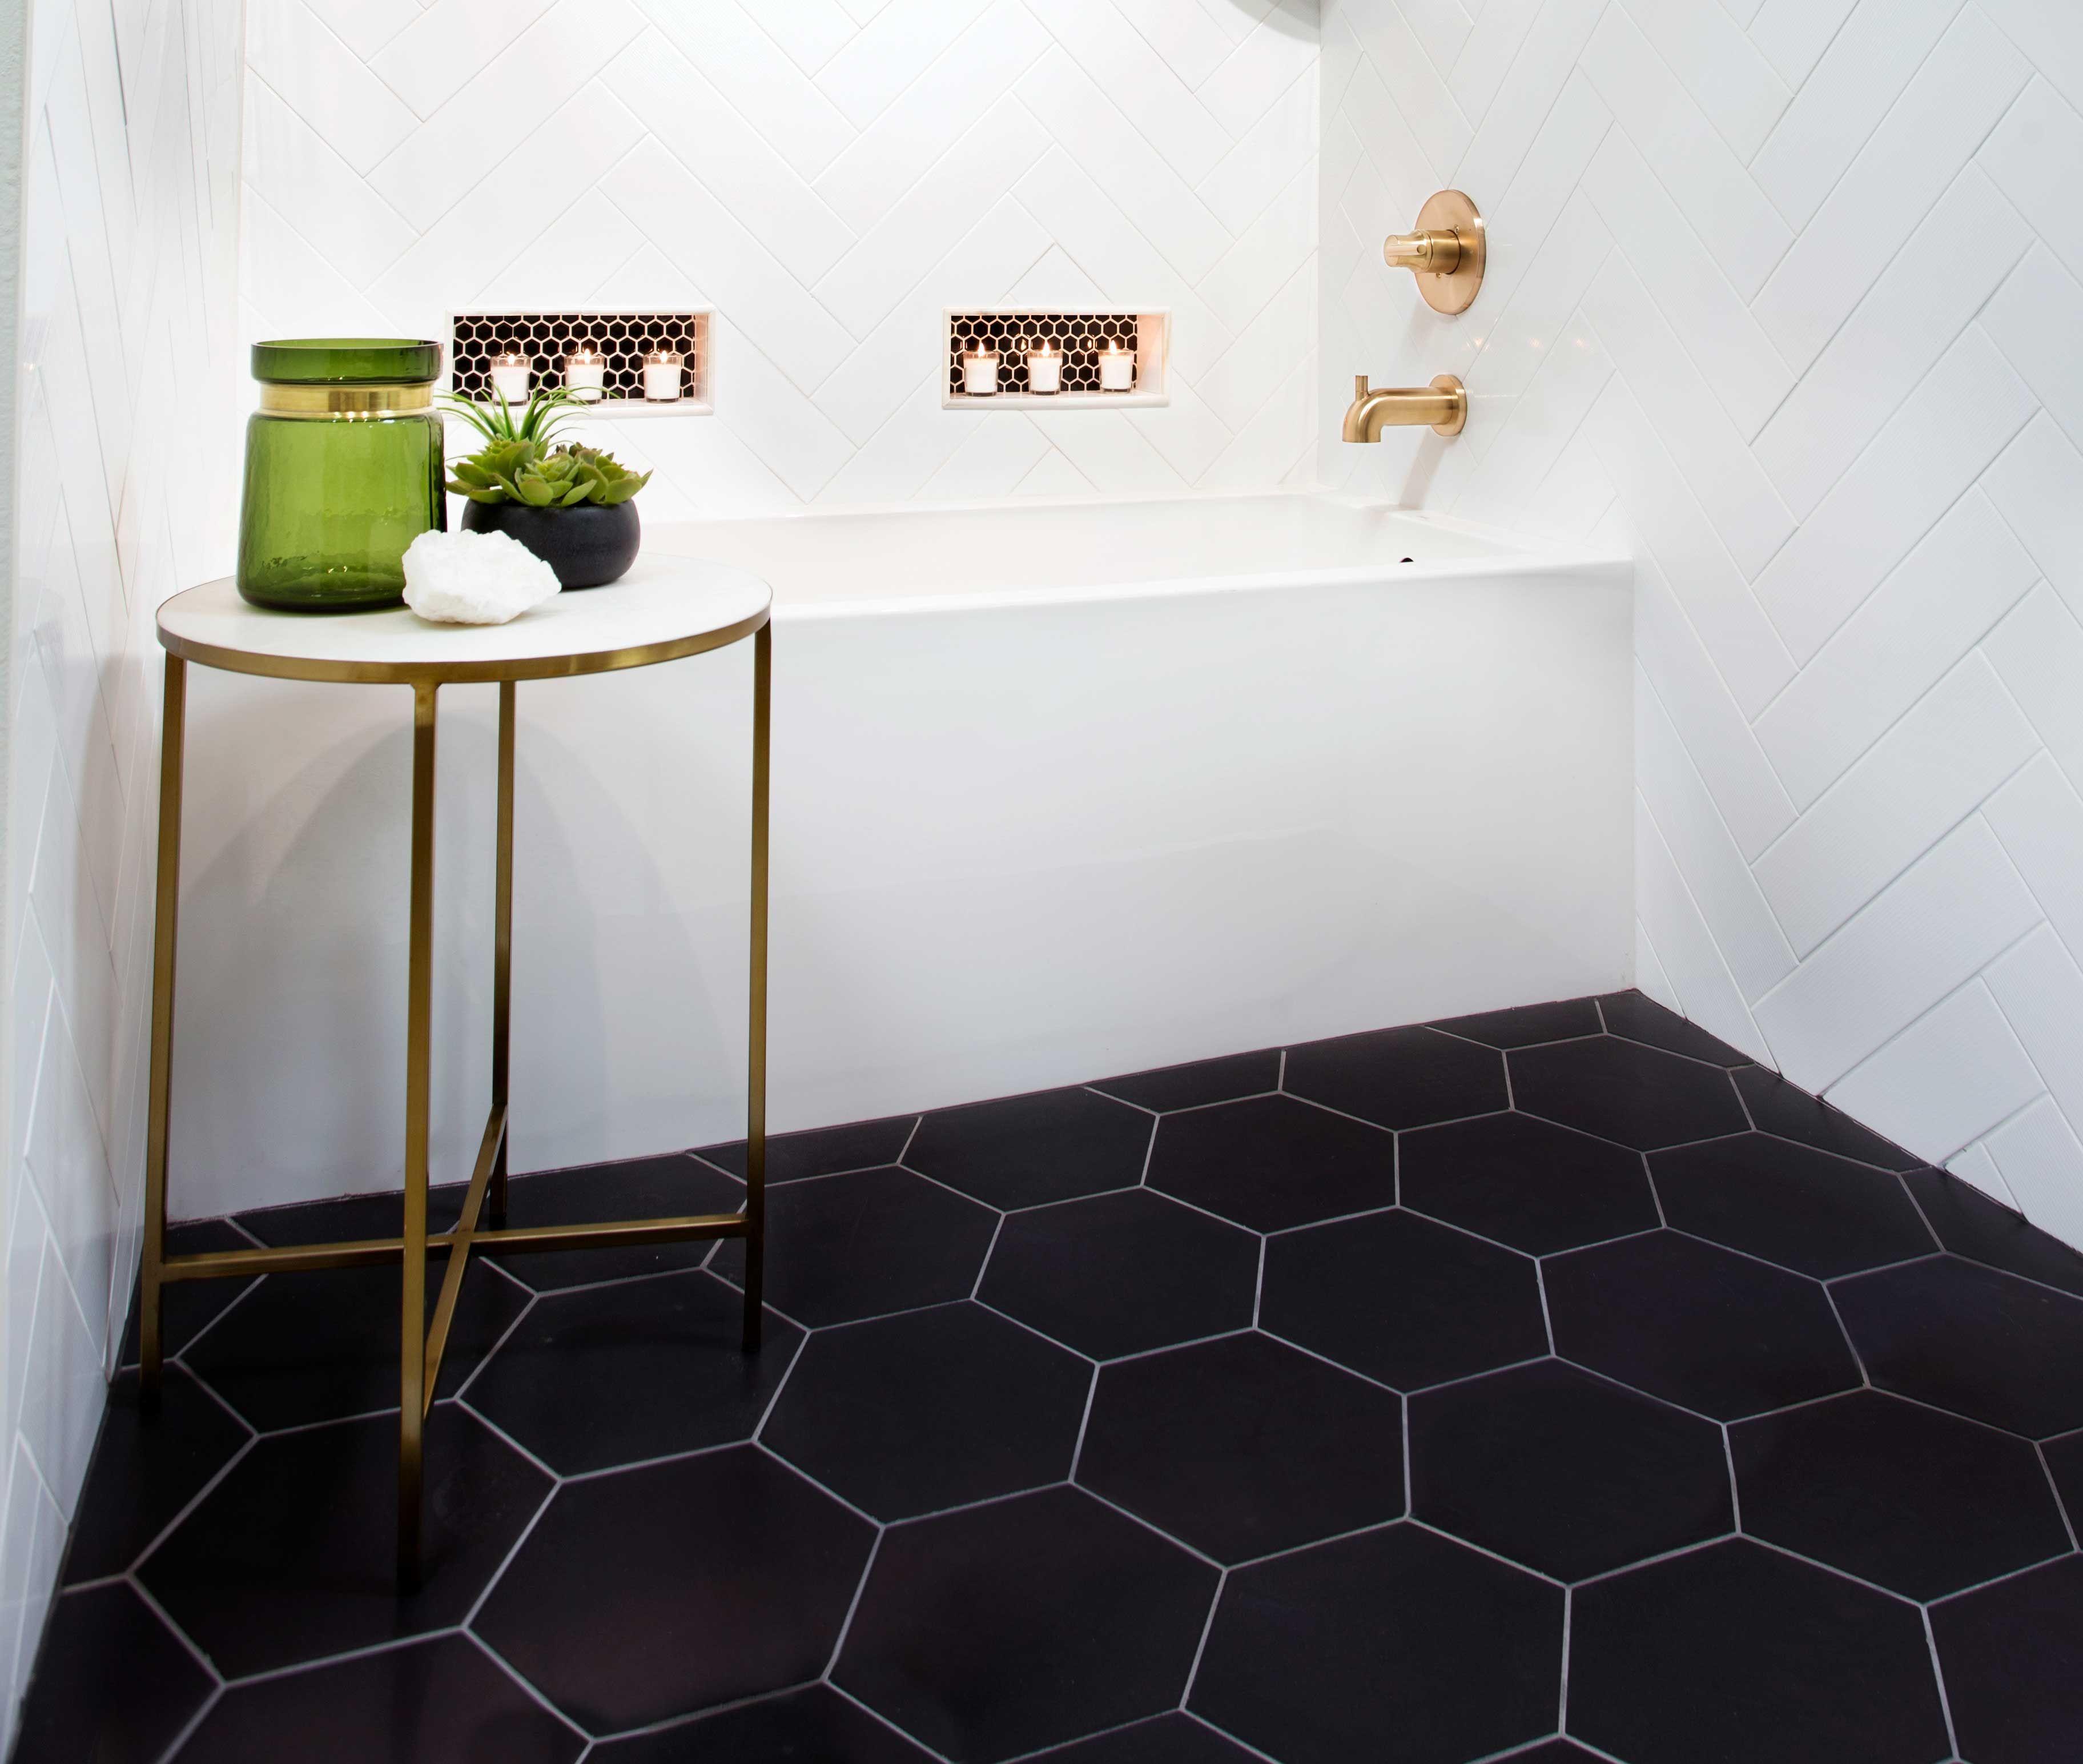 Black Hex Tile Floor In 2020 Black Bathroom Floor Black Tile Bathrooms Tile Floor Diy